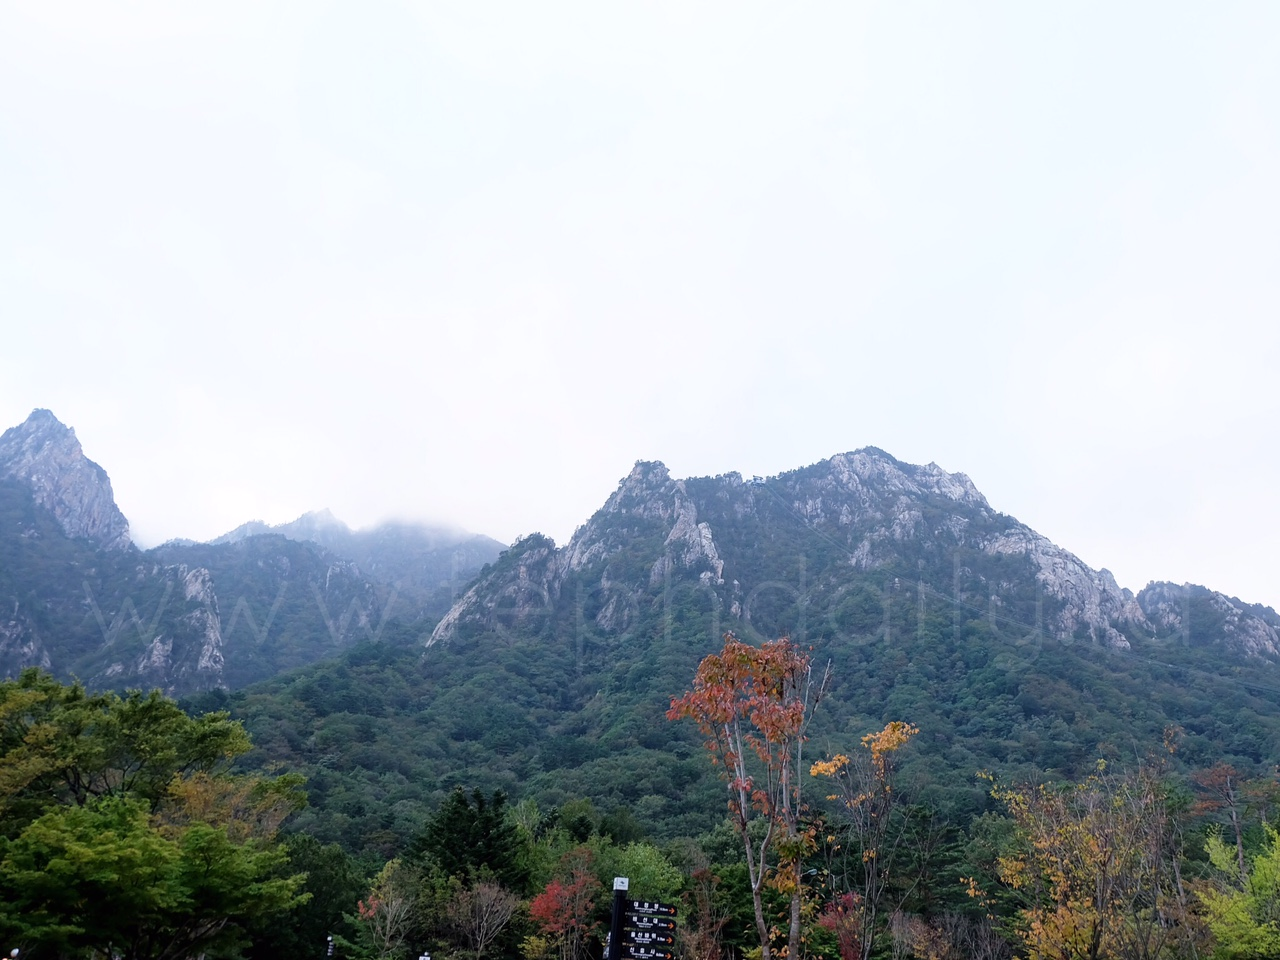 KOREA TRIP DAY 4 (MT. SORAK)